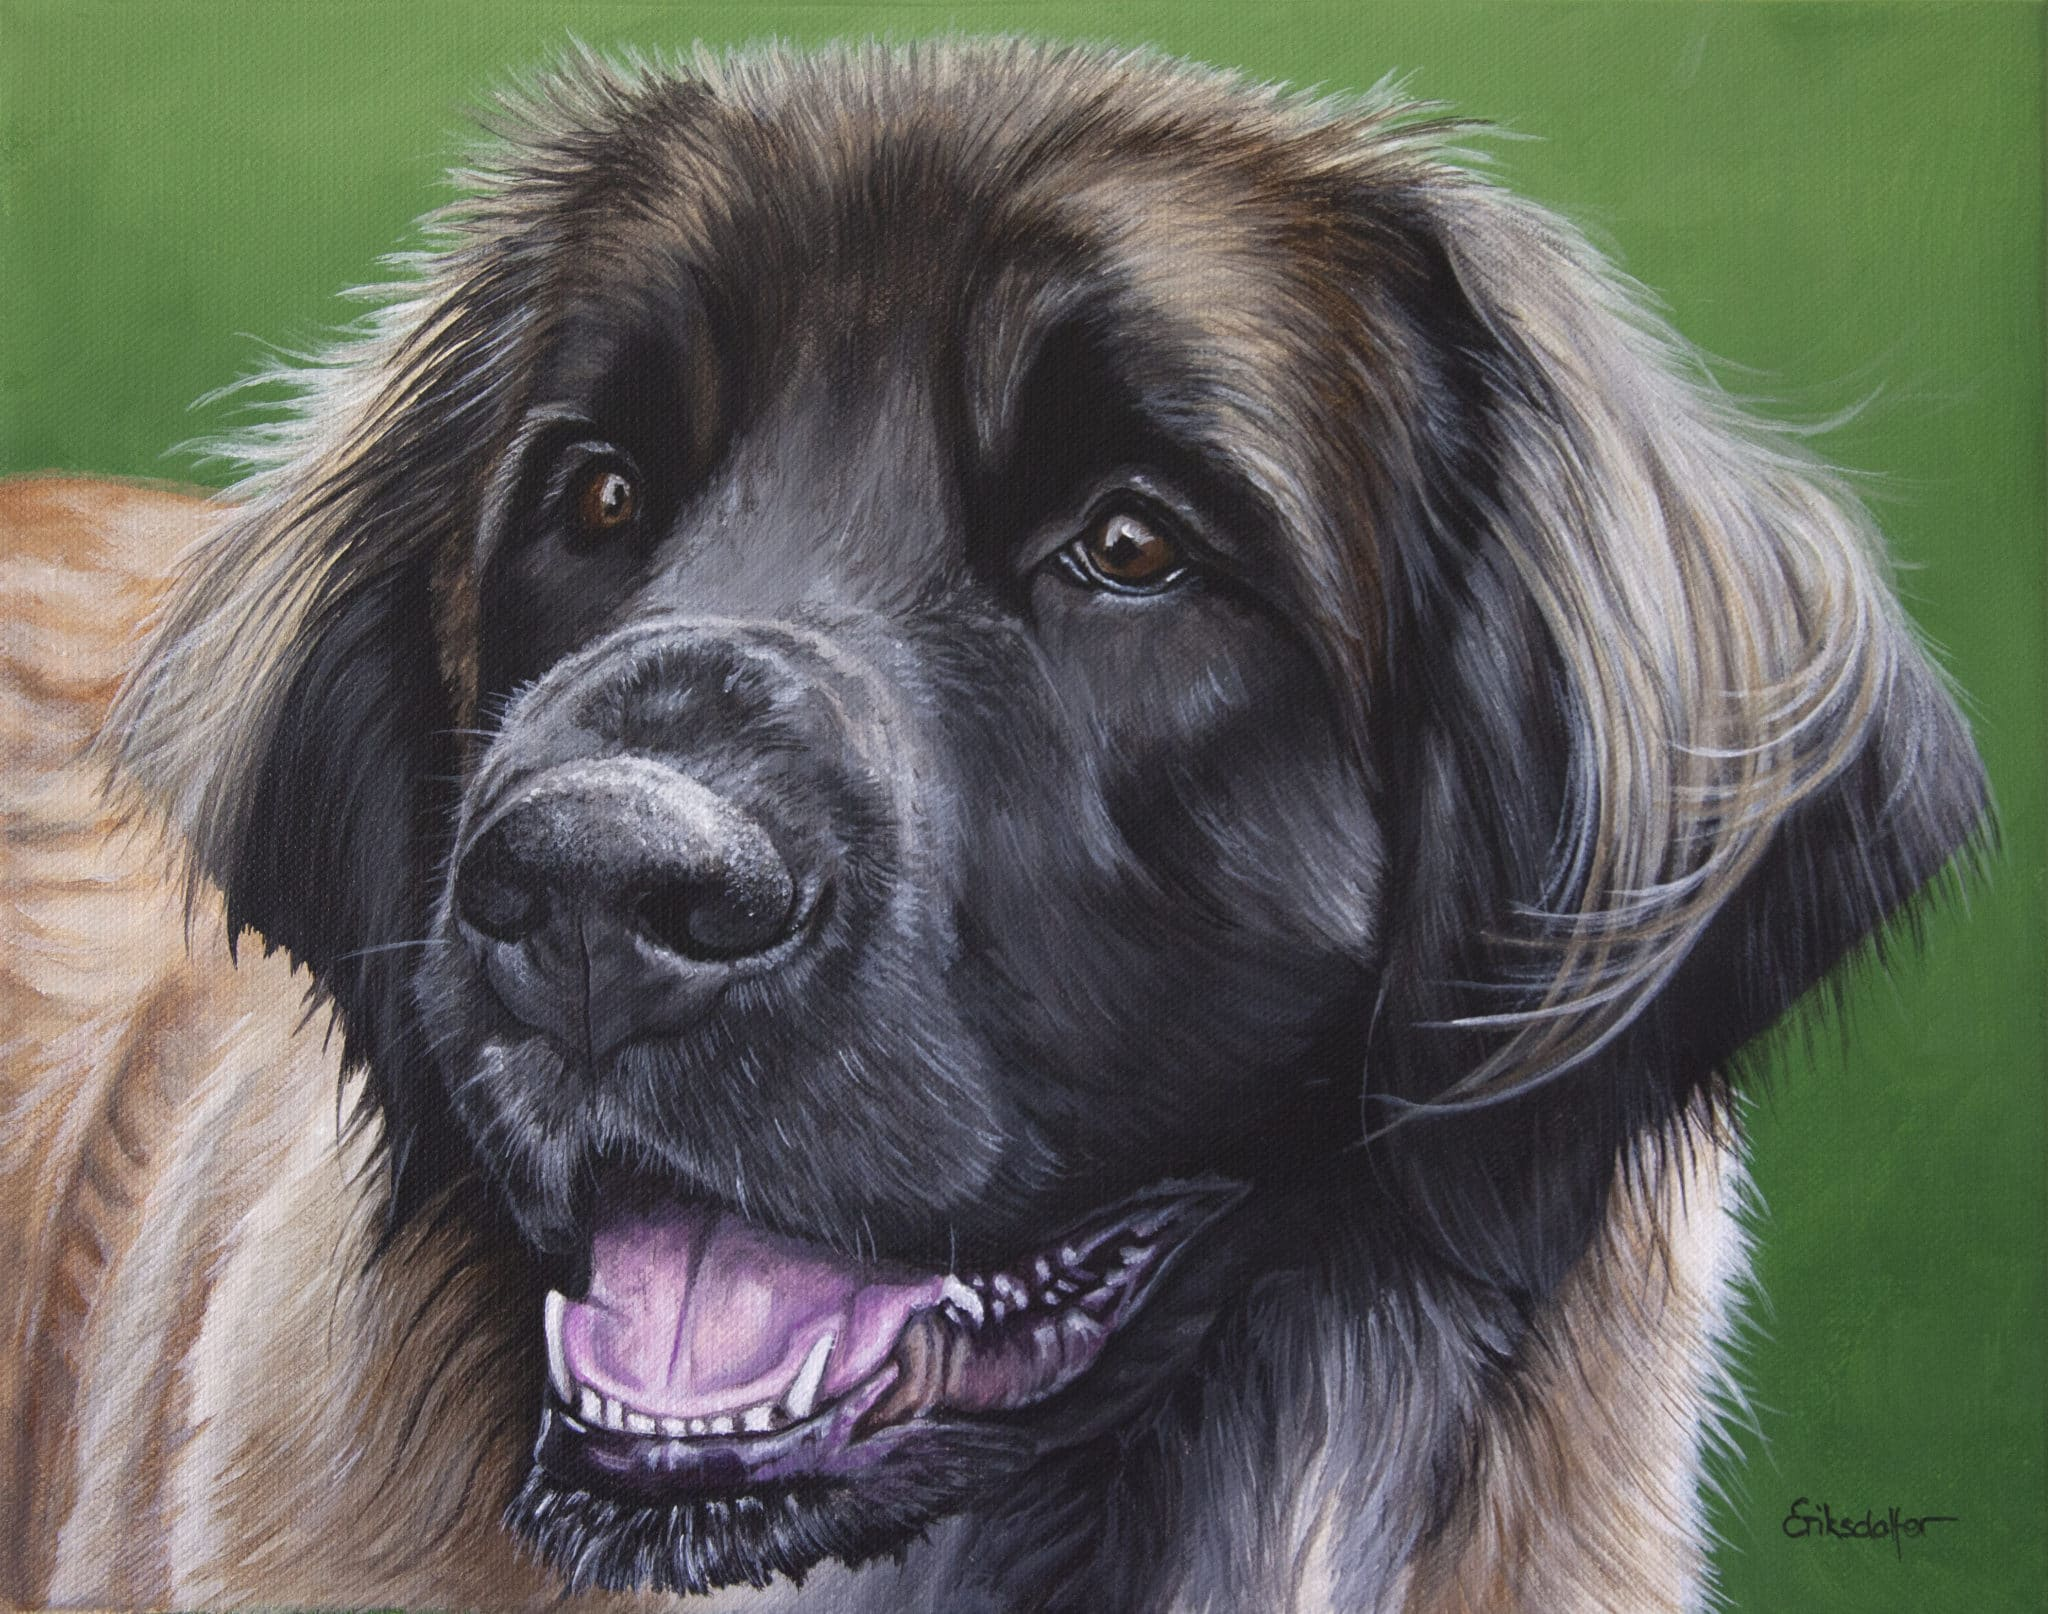 Elsa's Pet Portrait - original painting by Erica Eriksdotter of Studio Eriksdotter